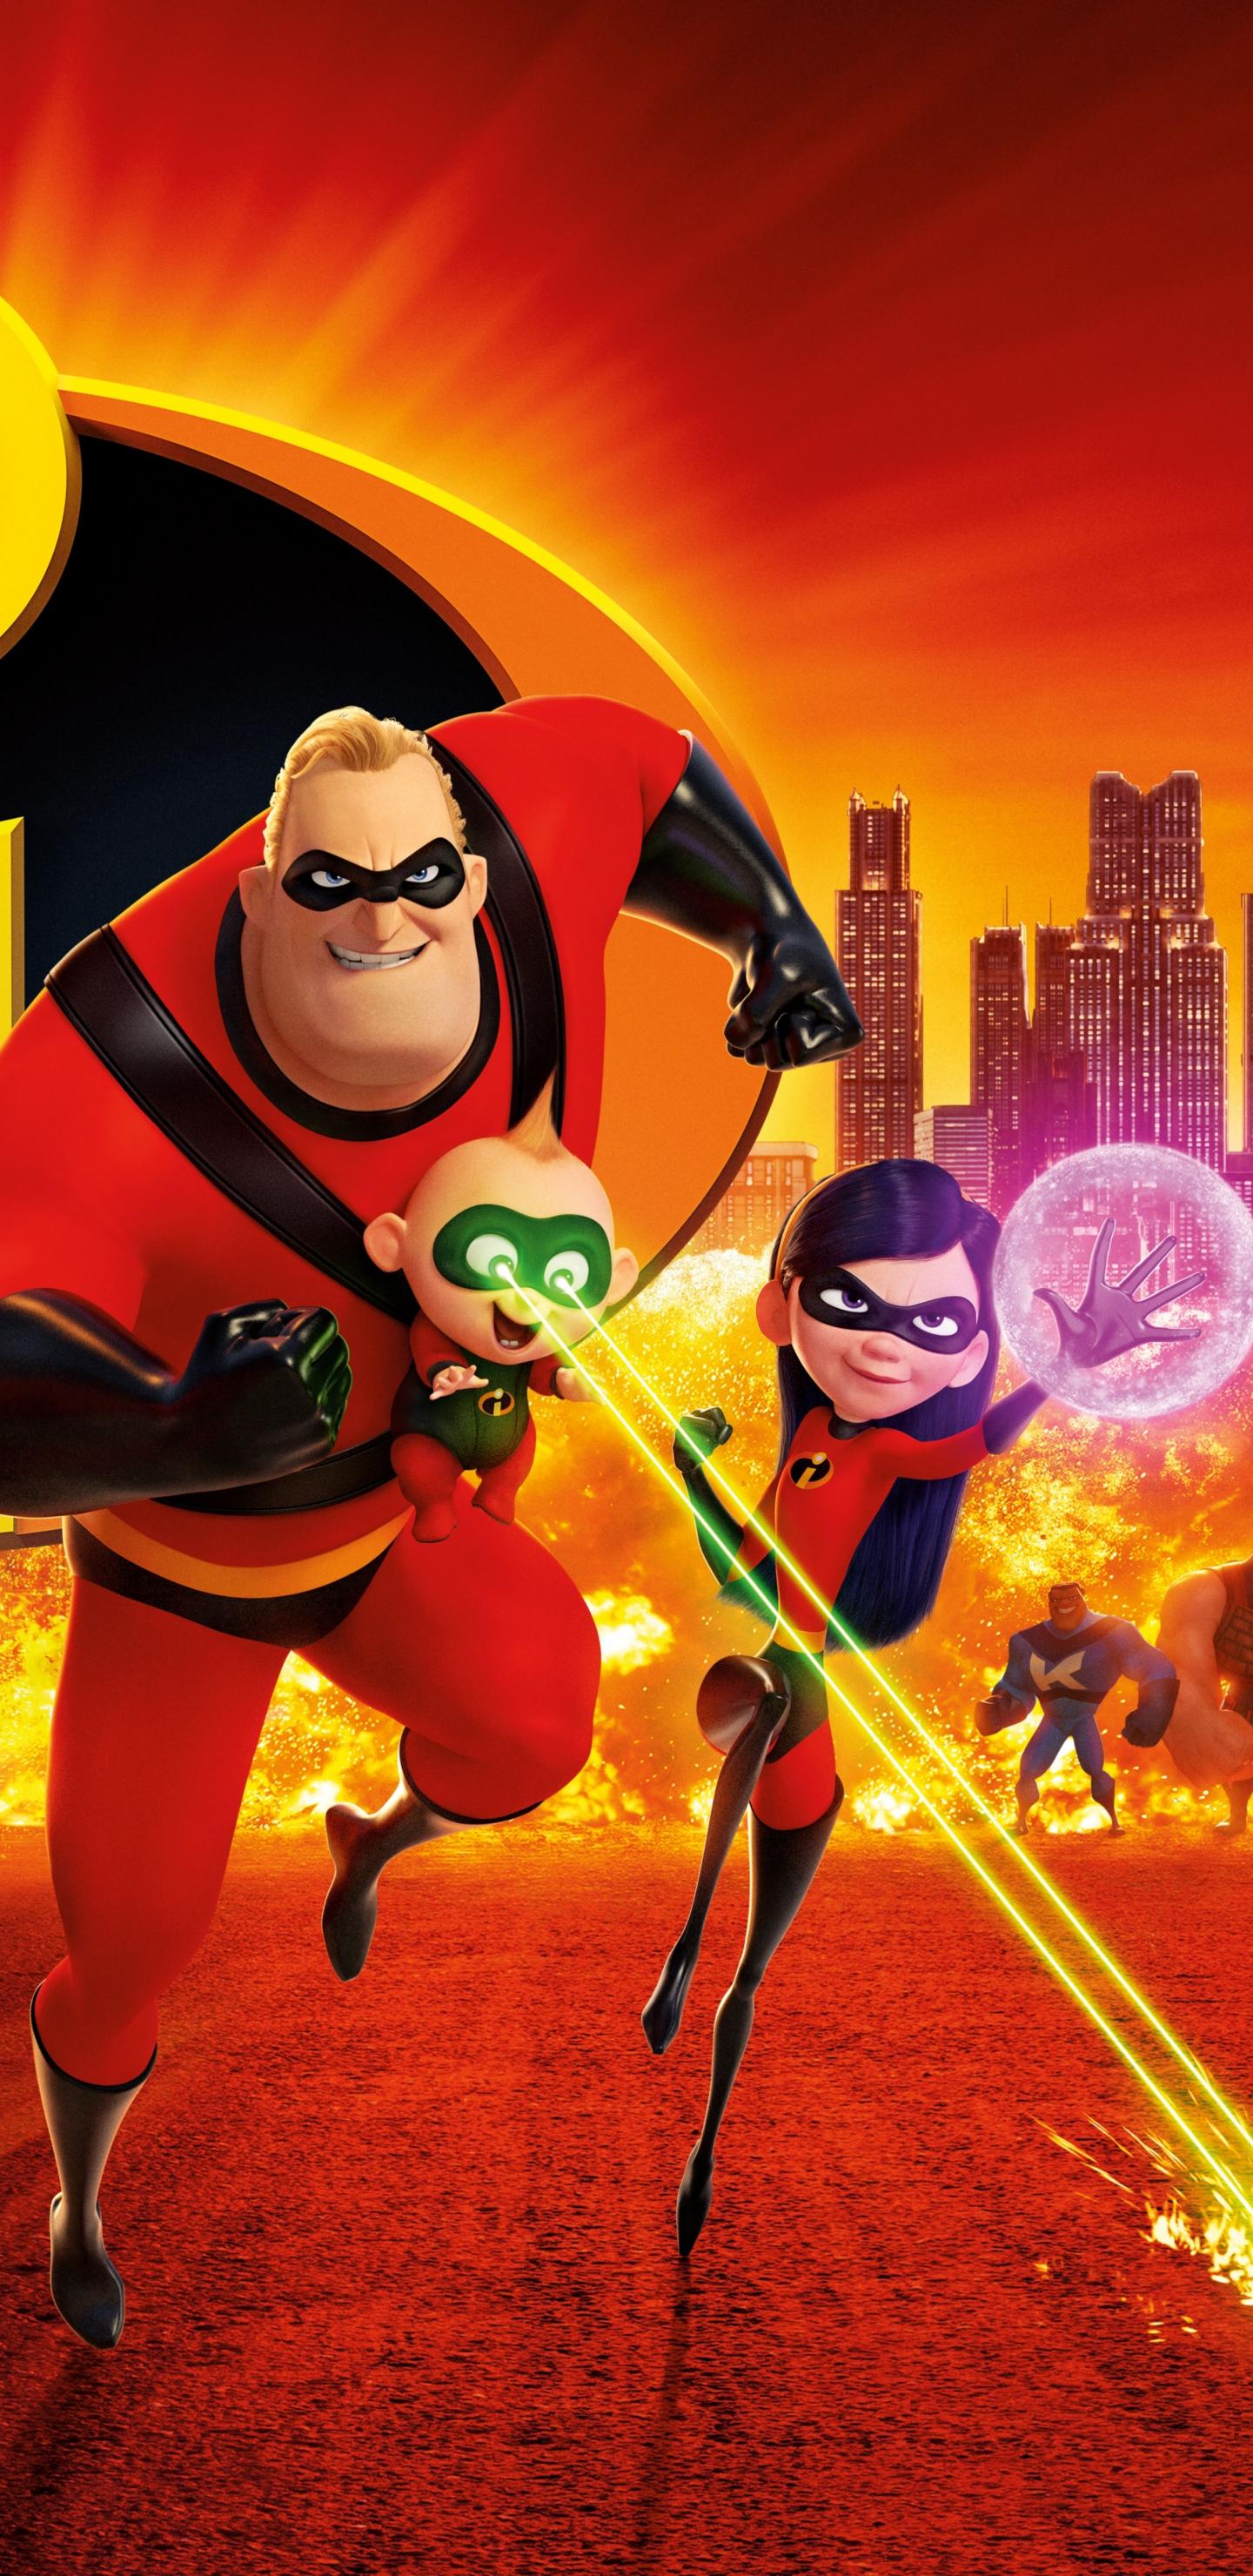 download 1440x2960 wallpaper 2018, animation movie, superheroes